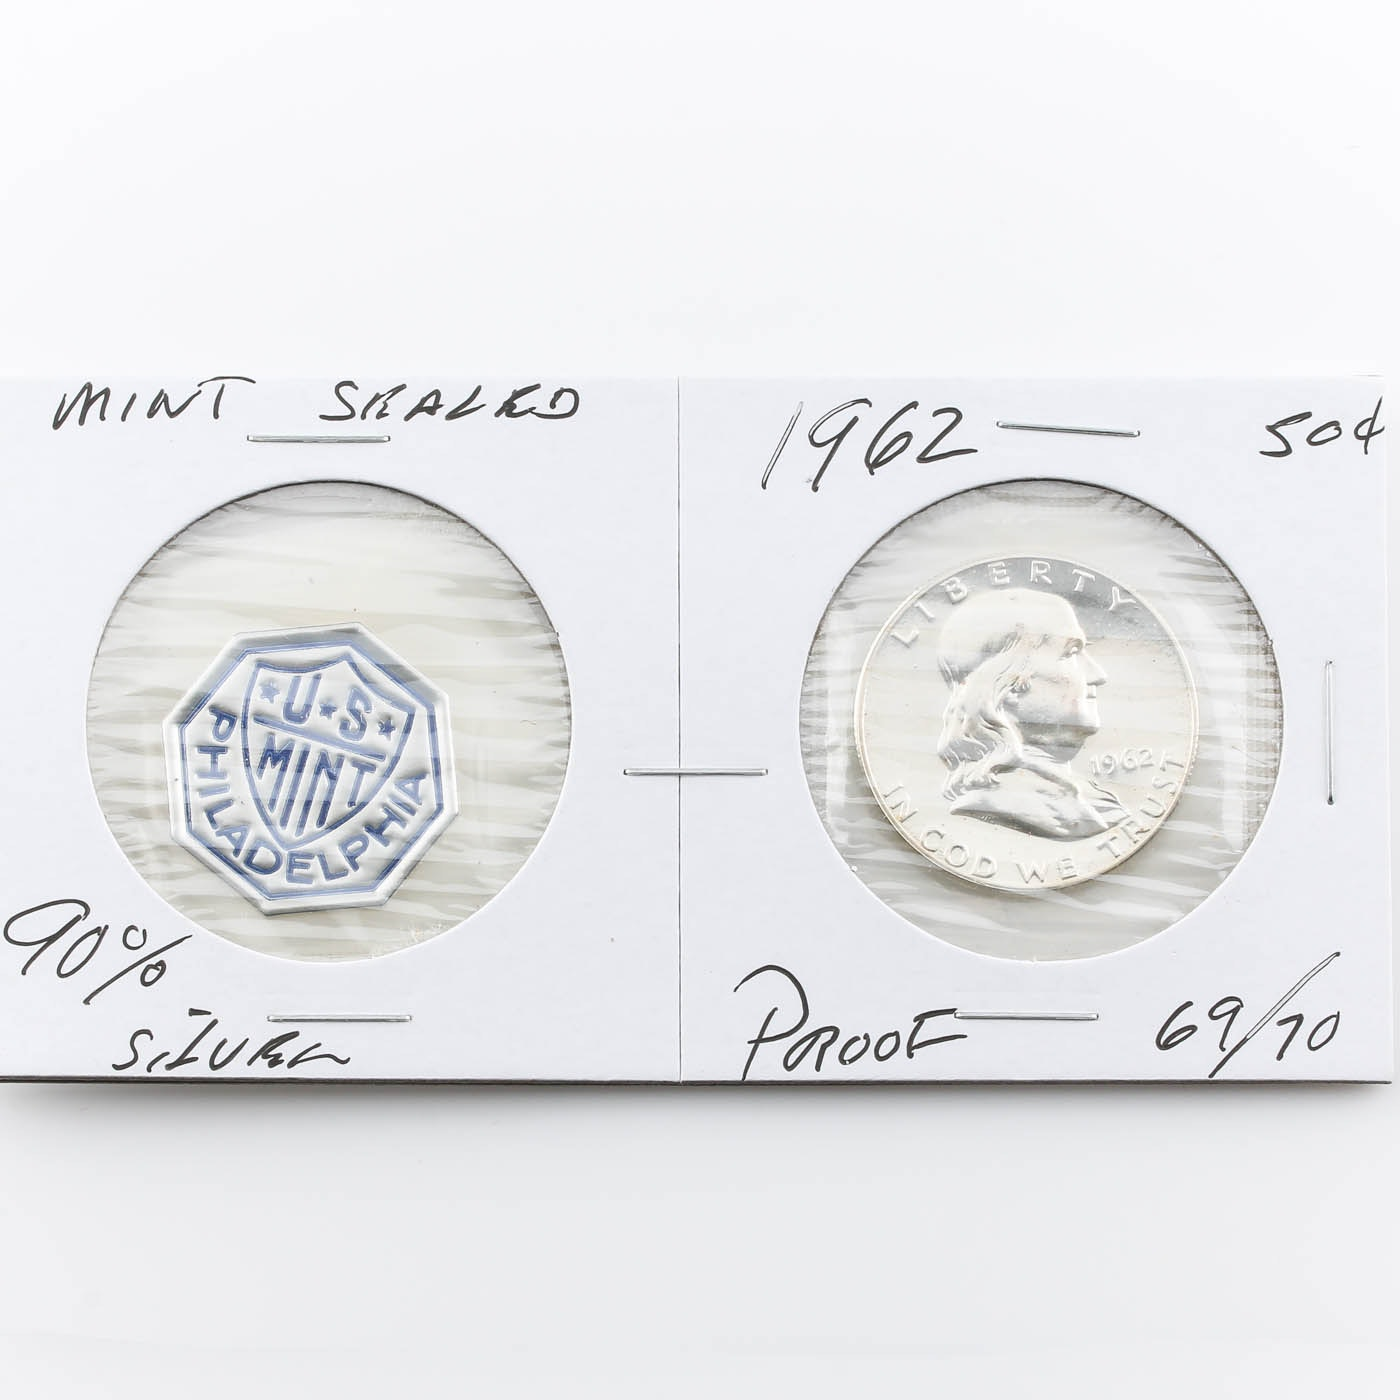 1962 Franklin Silver Half Dollar Proof Coin